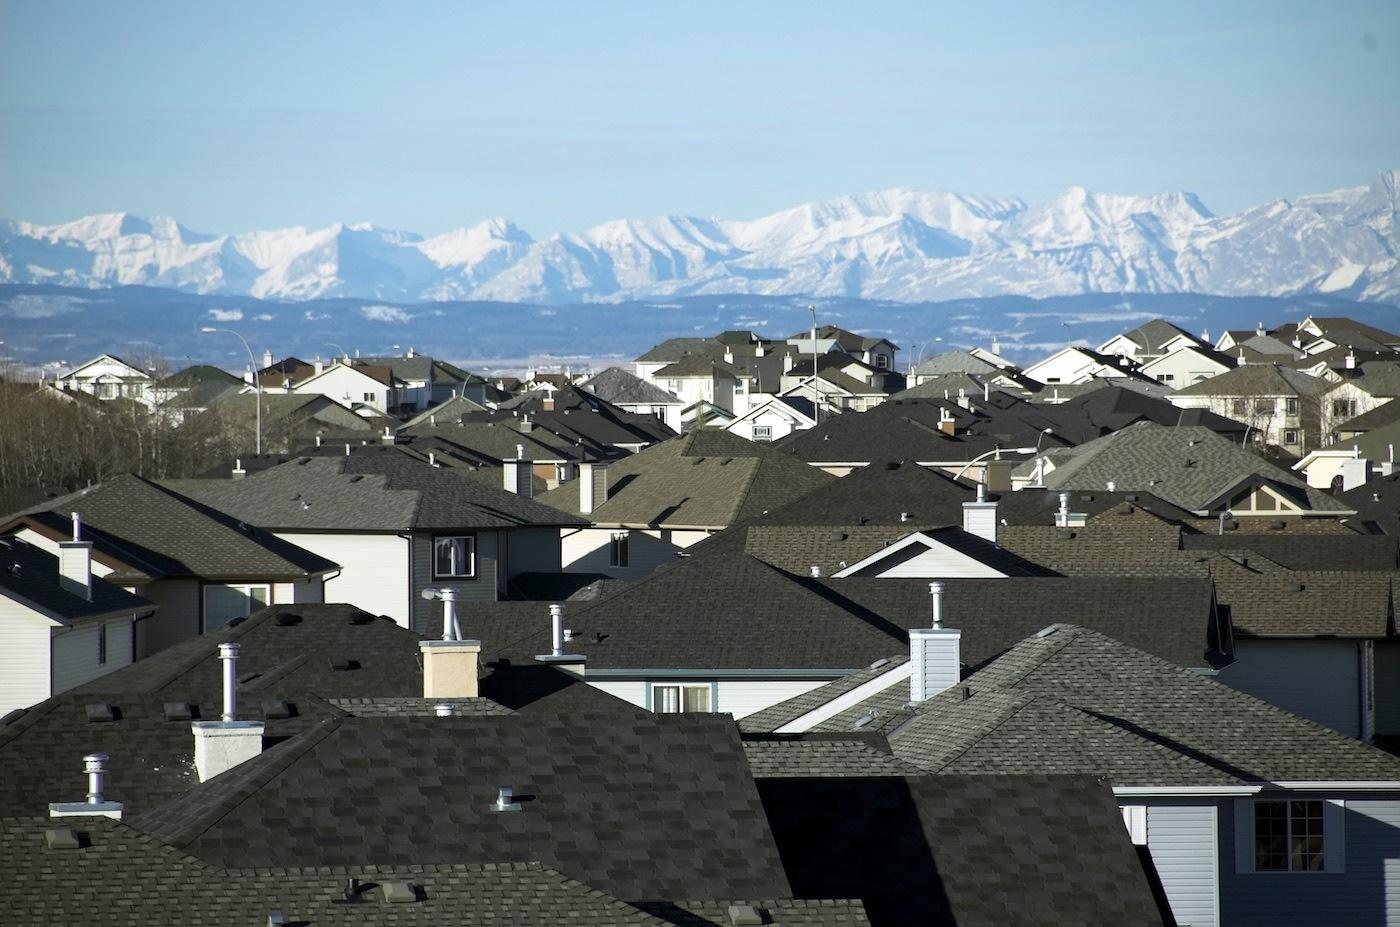 Sprawlcast: Six mayoral hopefuls on growth—and the Green Line | The Sprawl